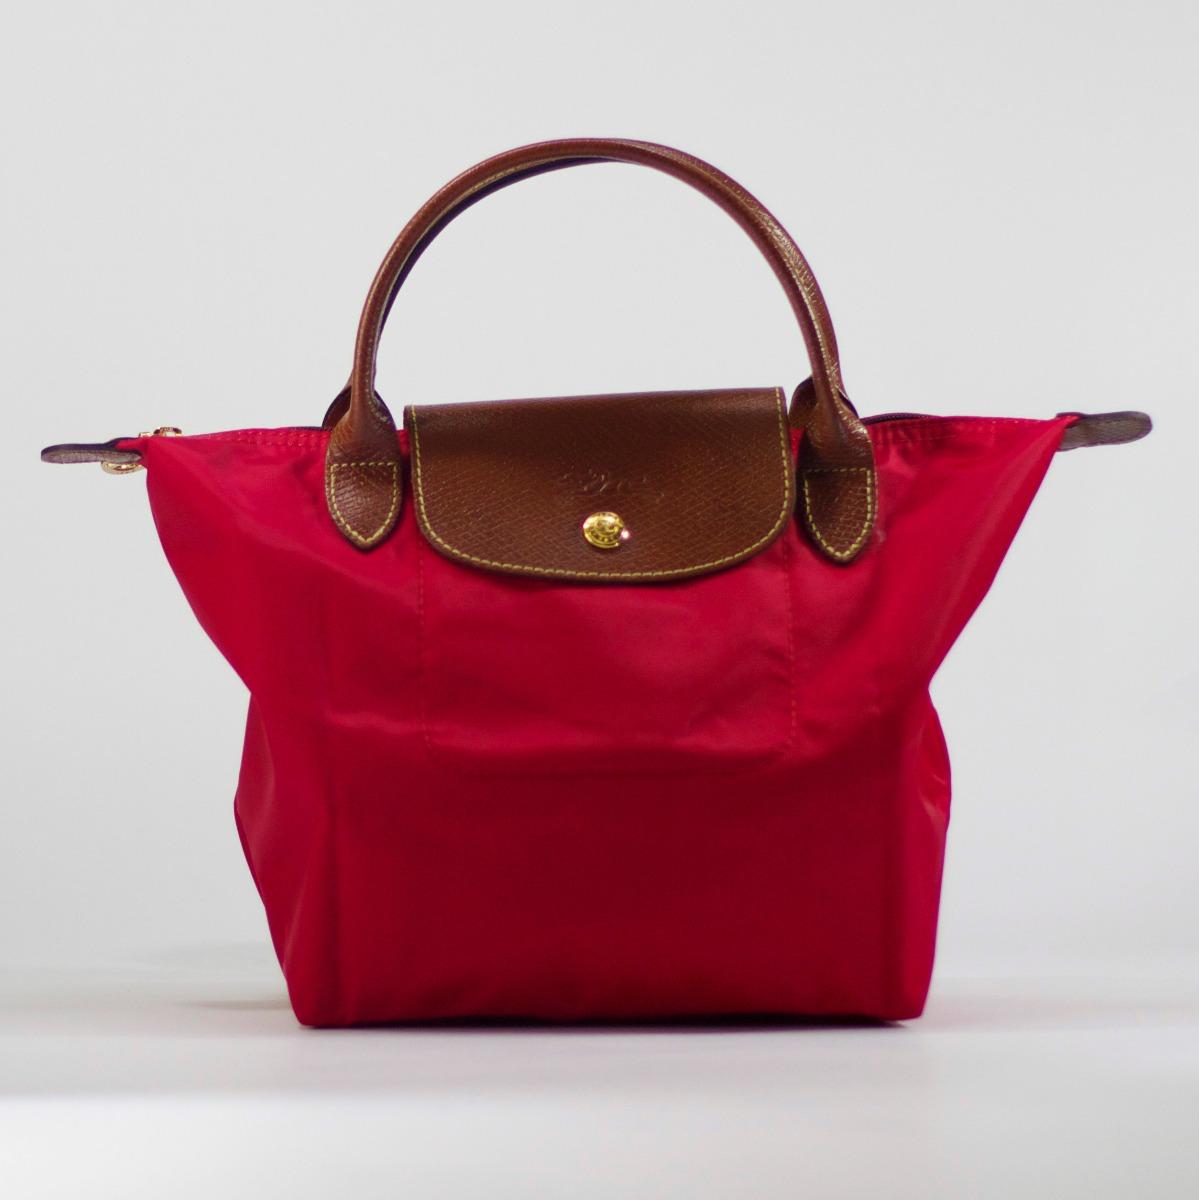 Carteras Longchamp Originales